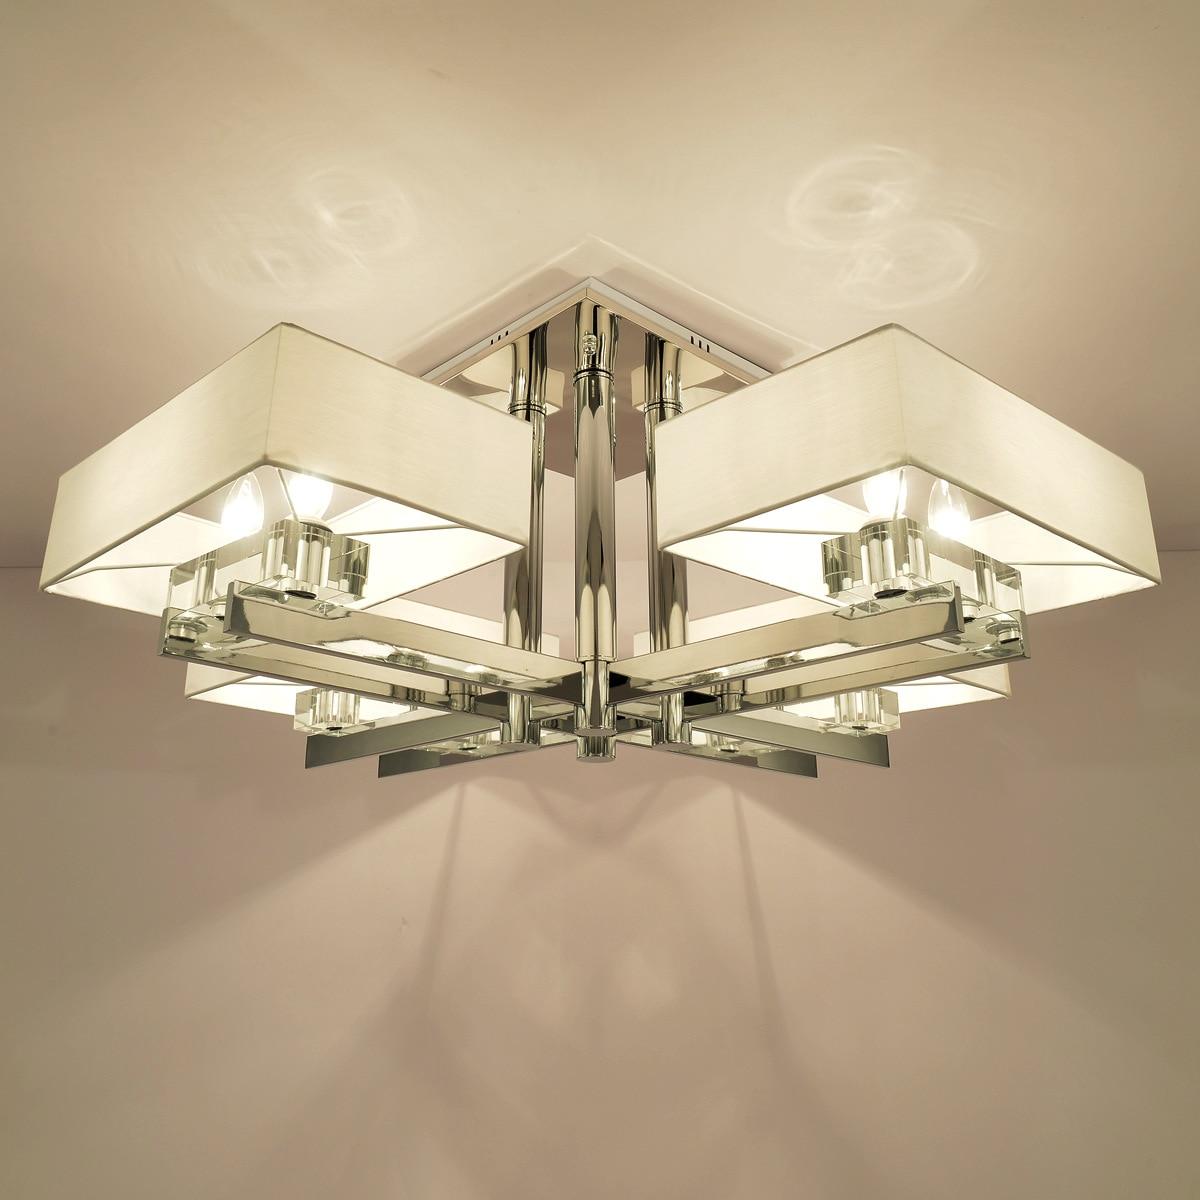 LED-Schlafzimmer Kronleuchter aus Kristall Laterne ...